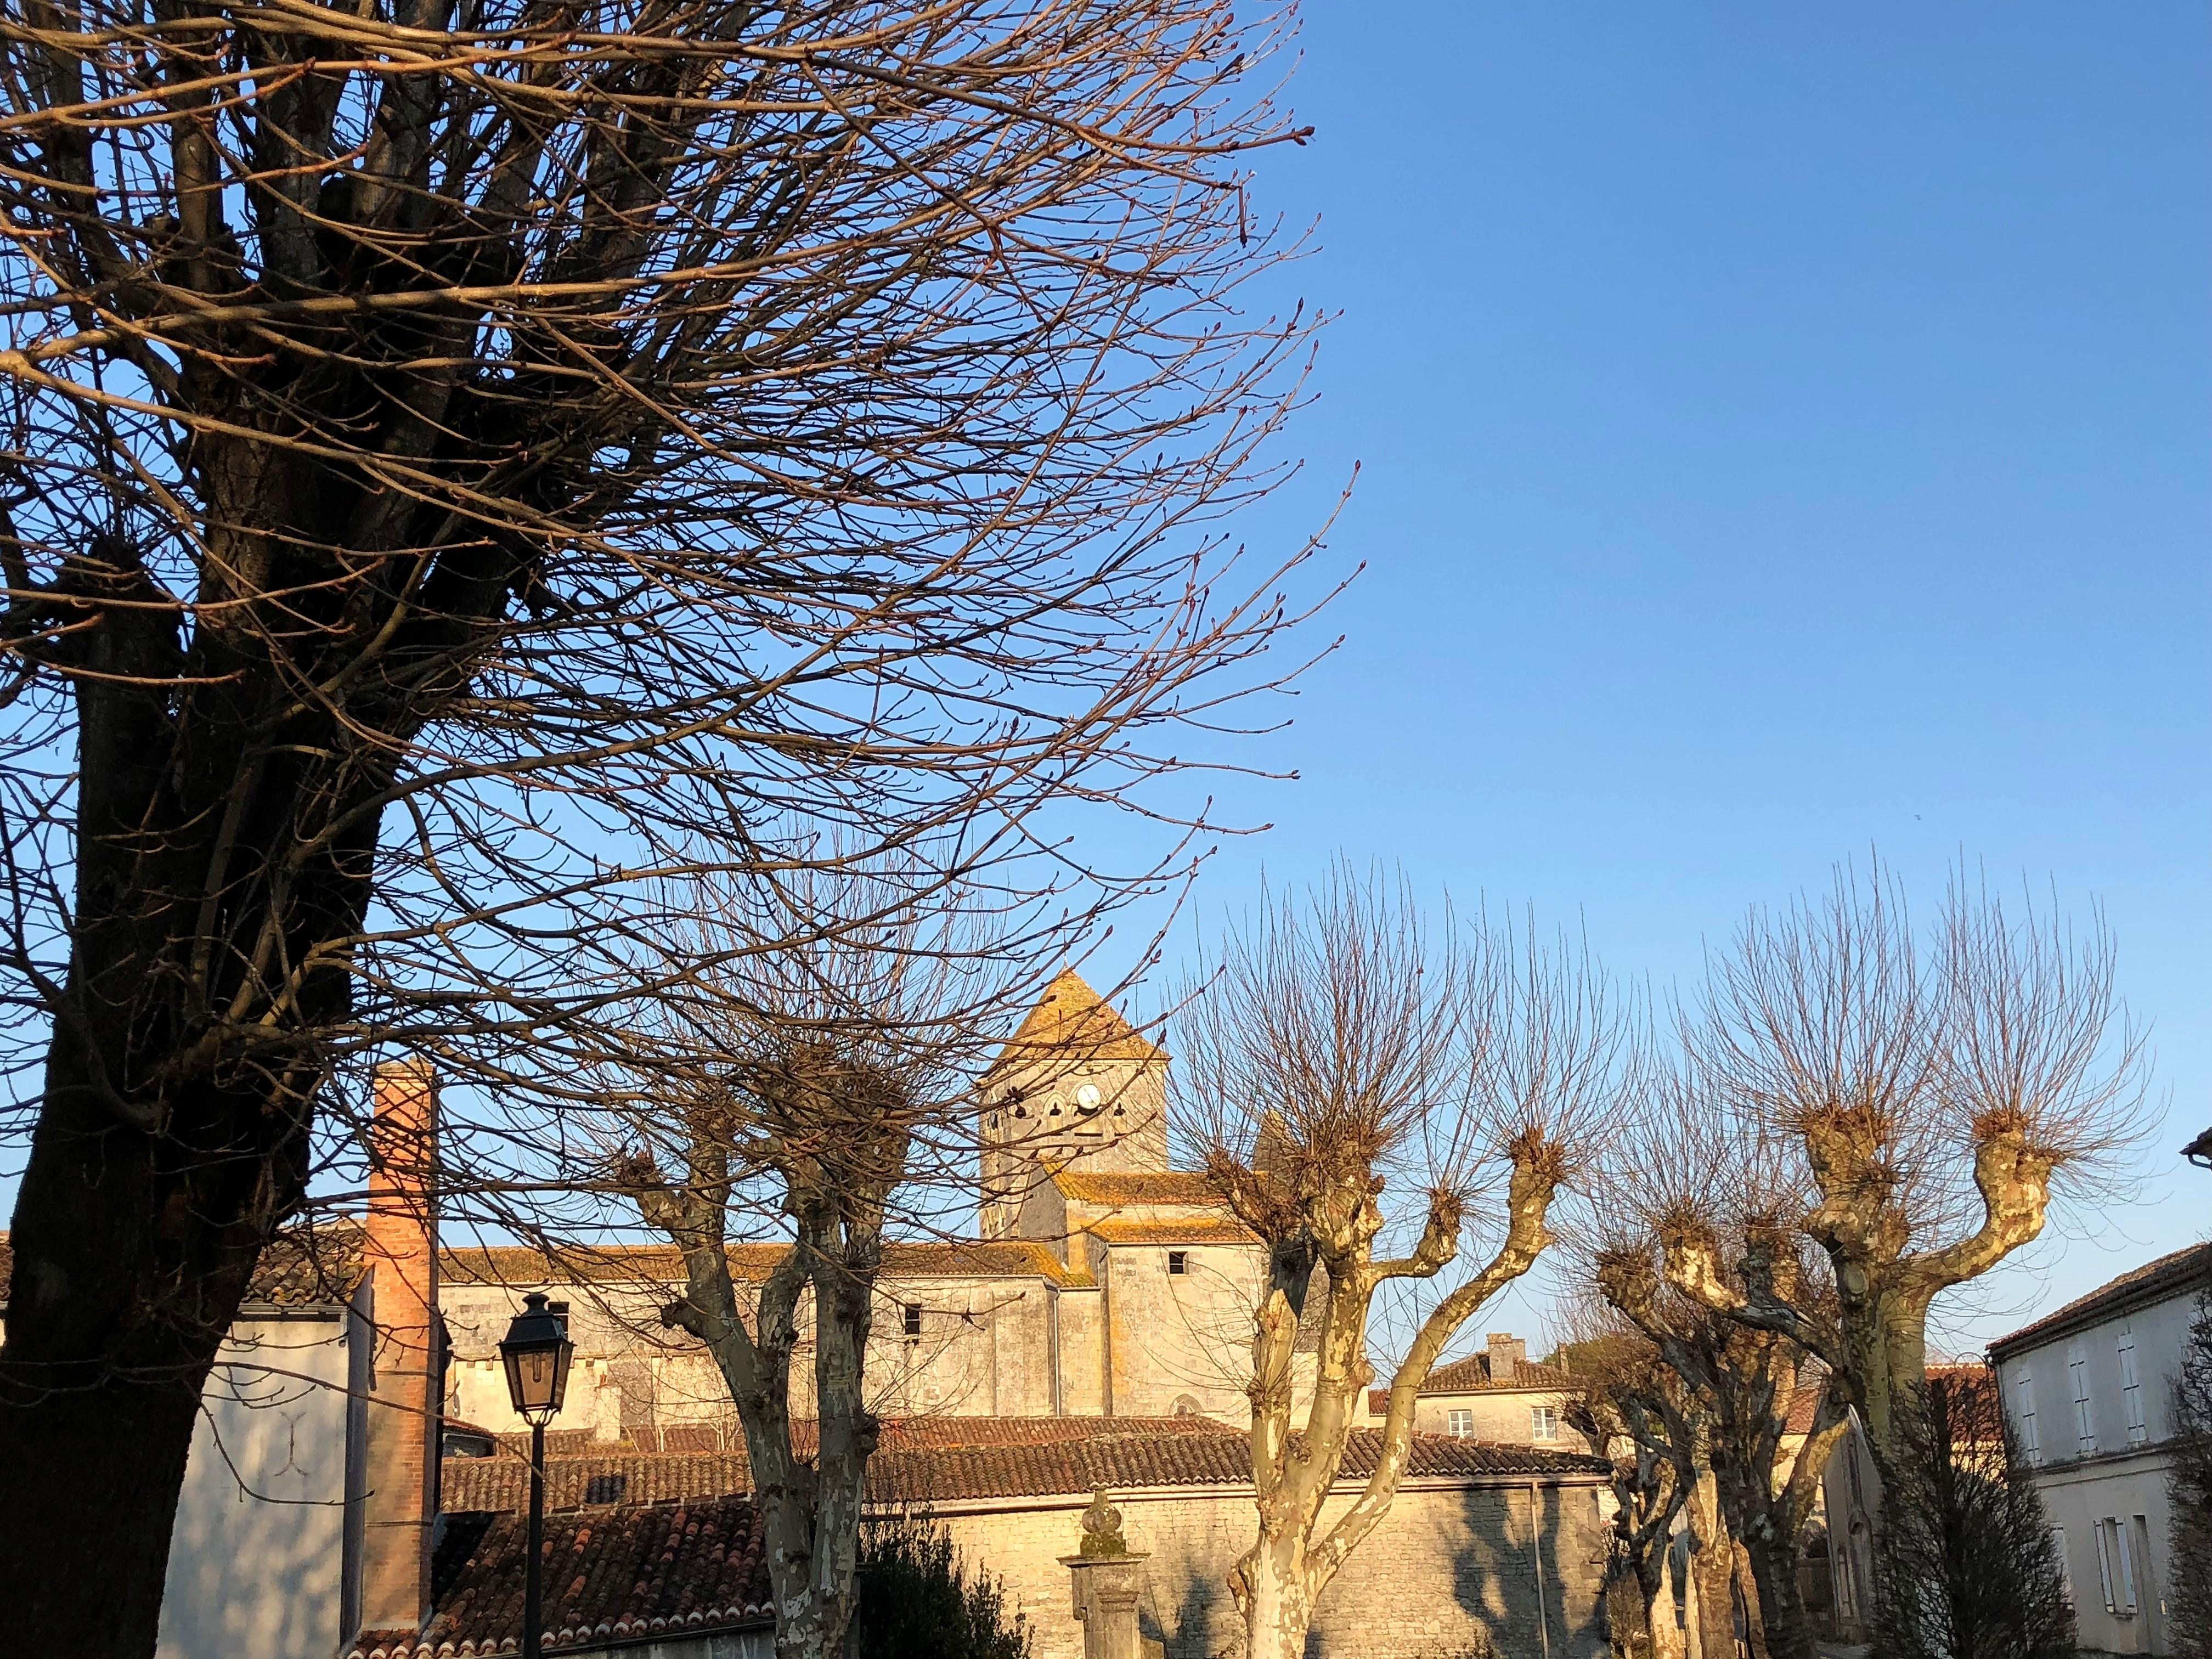 livingincognac 2018 - Mérignac